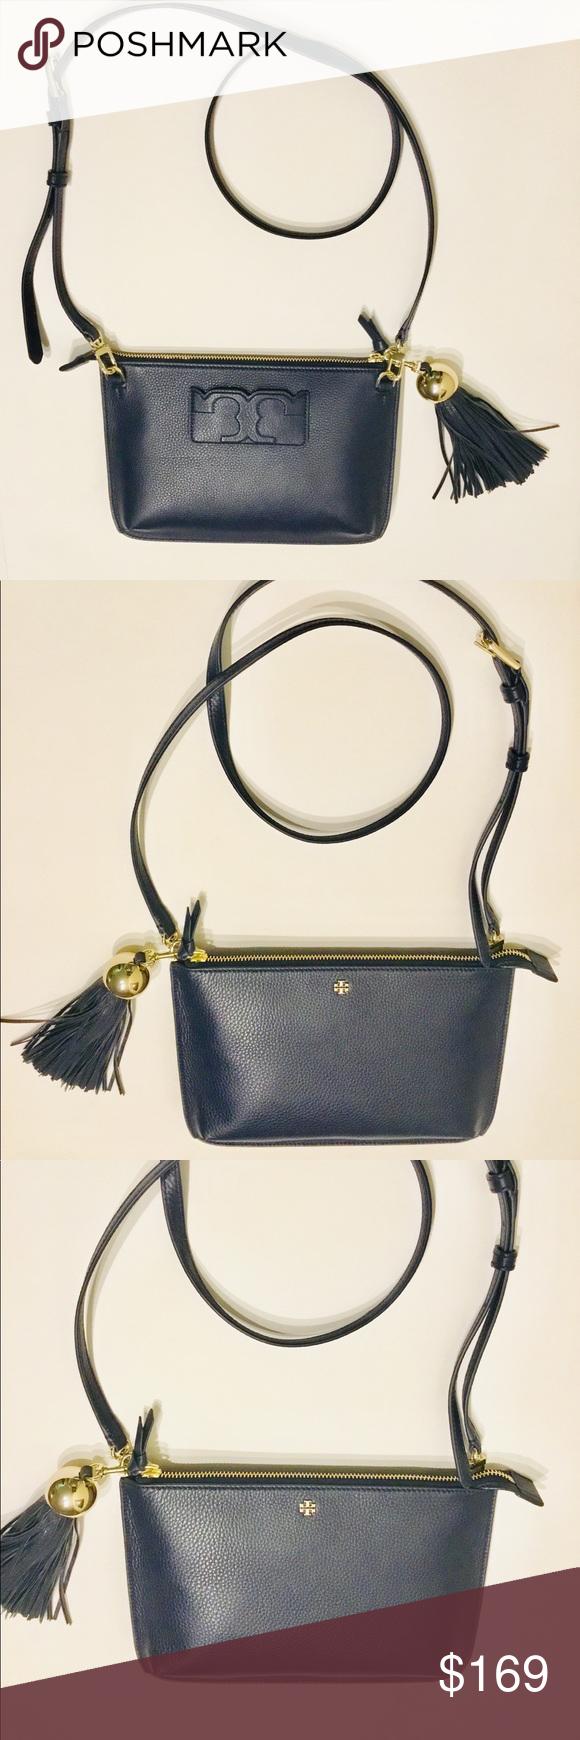 Spotted while shopping on Poshmark  🎊 🎉🎈 Tory Burch Tassel Crossbody in  Navy Blue!  poshmark  fashion  shopping  style  Tory Burch  Handbags b183d7d112